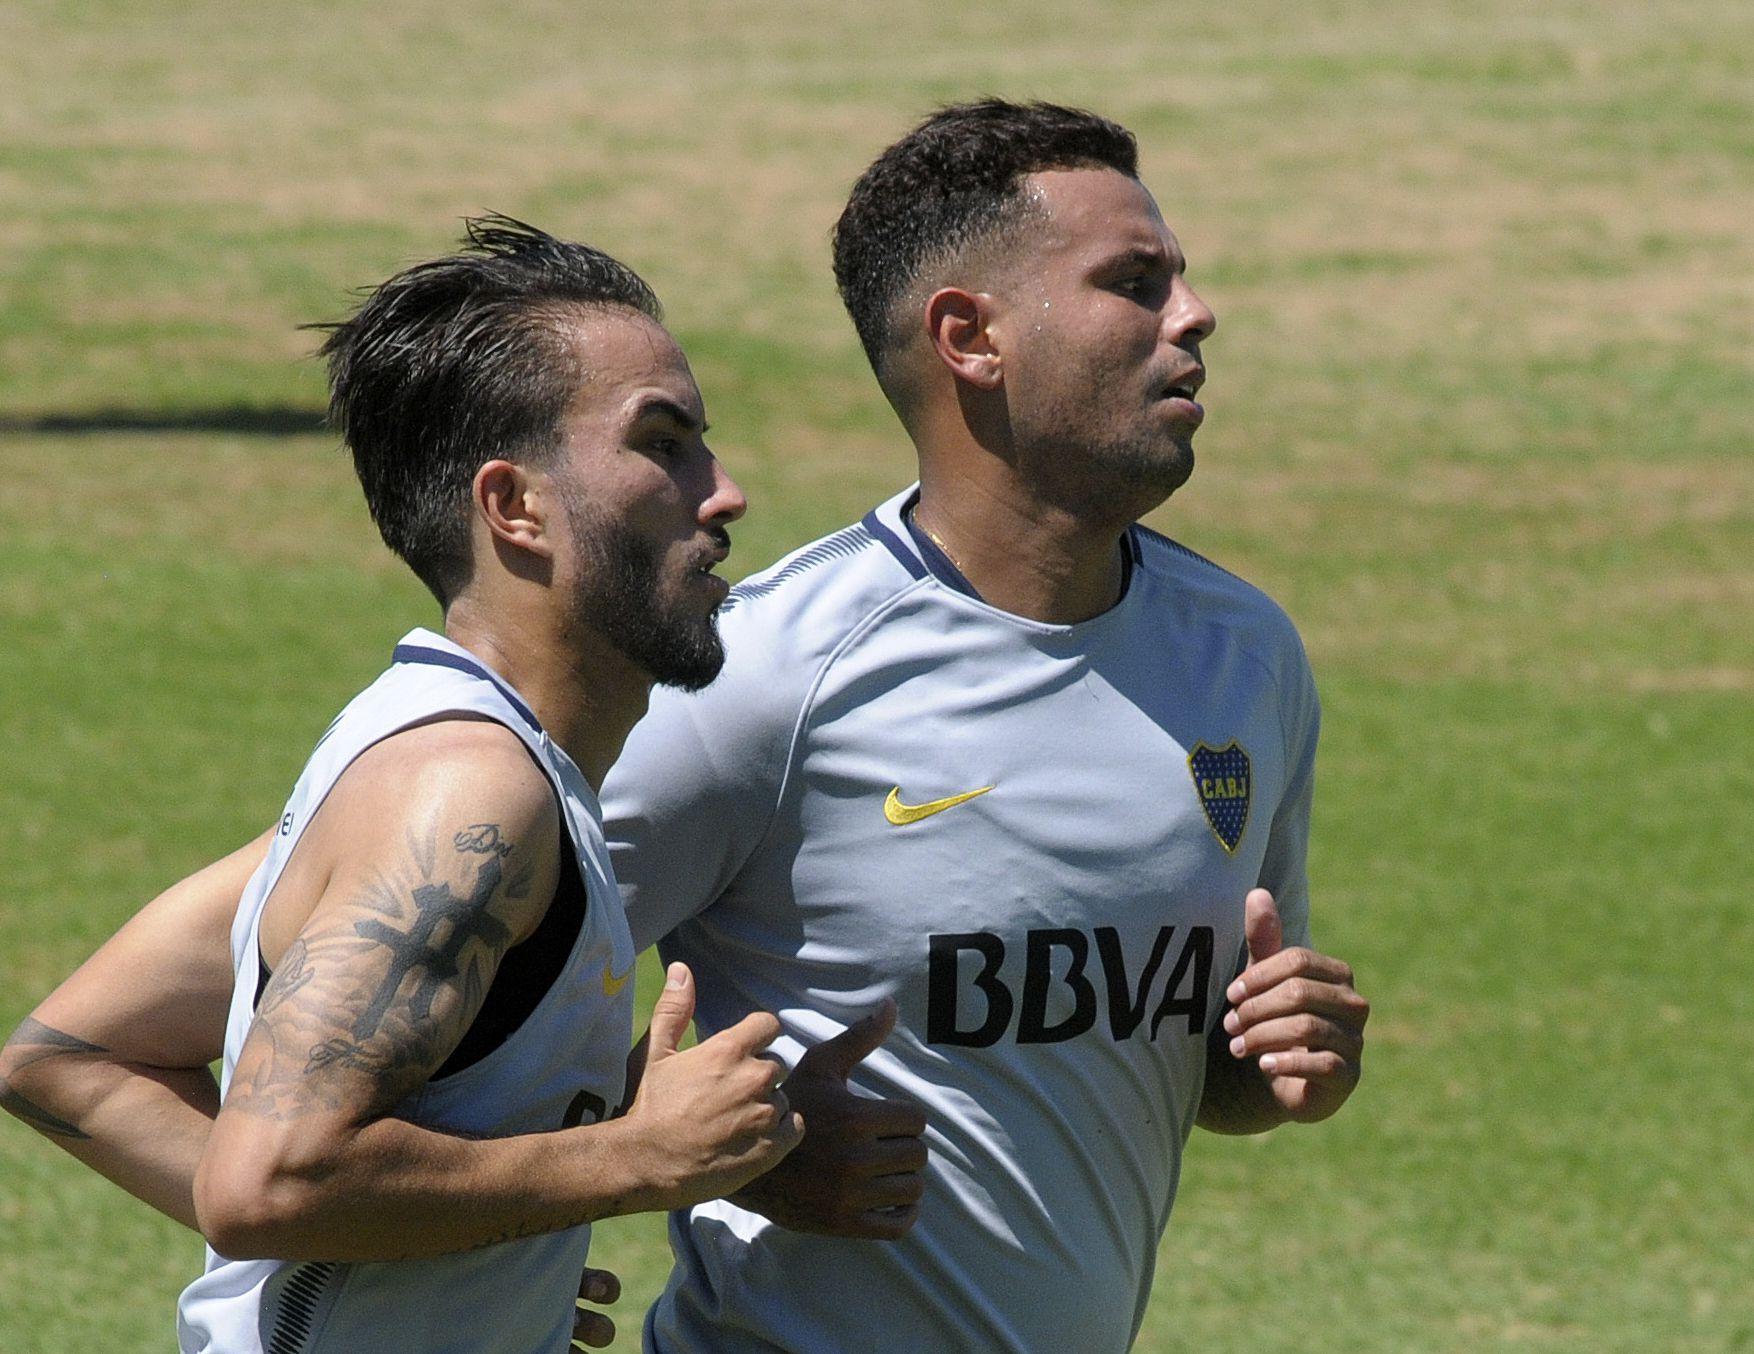 Sebastián Pérez y Edwin Cardona durante la pretemporada de Boca en 2018 (Foto NA: SANTIAGO PANDOLFI)